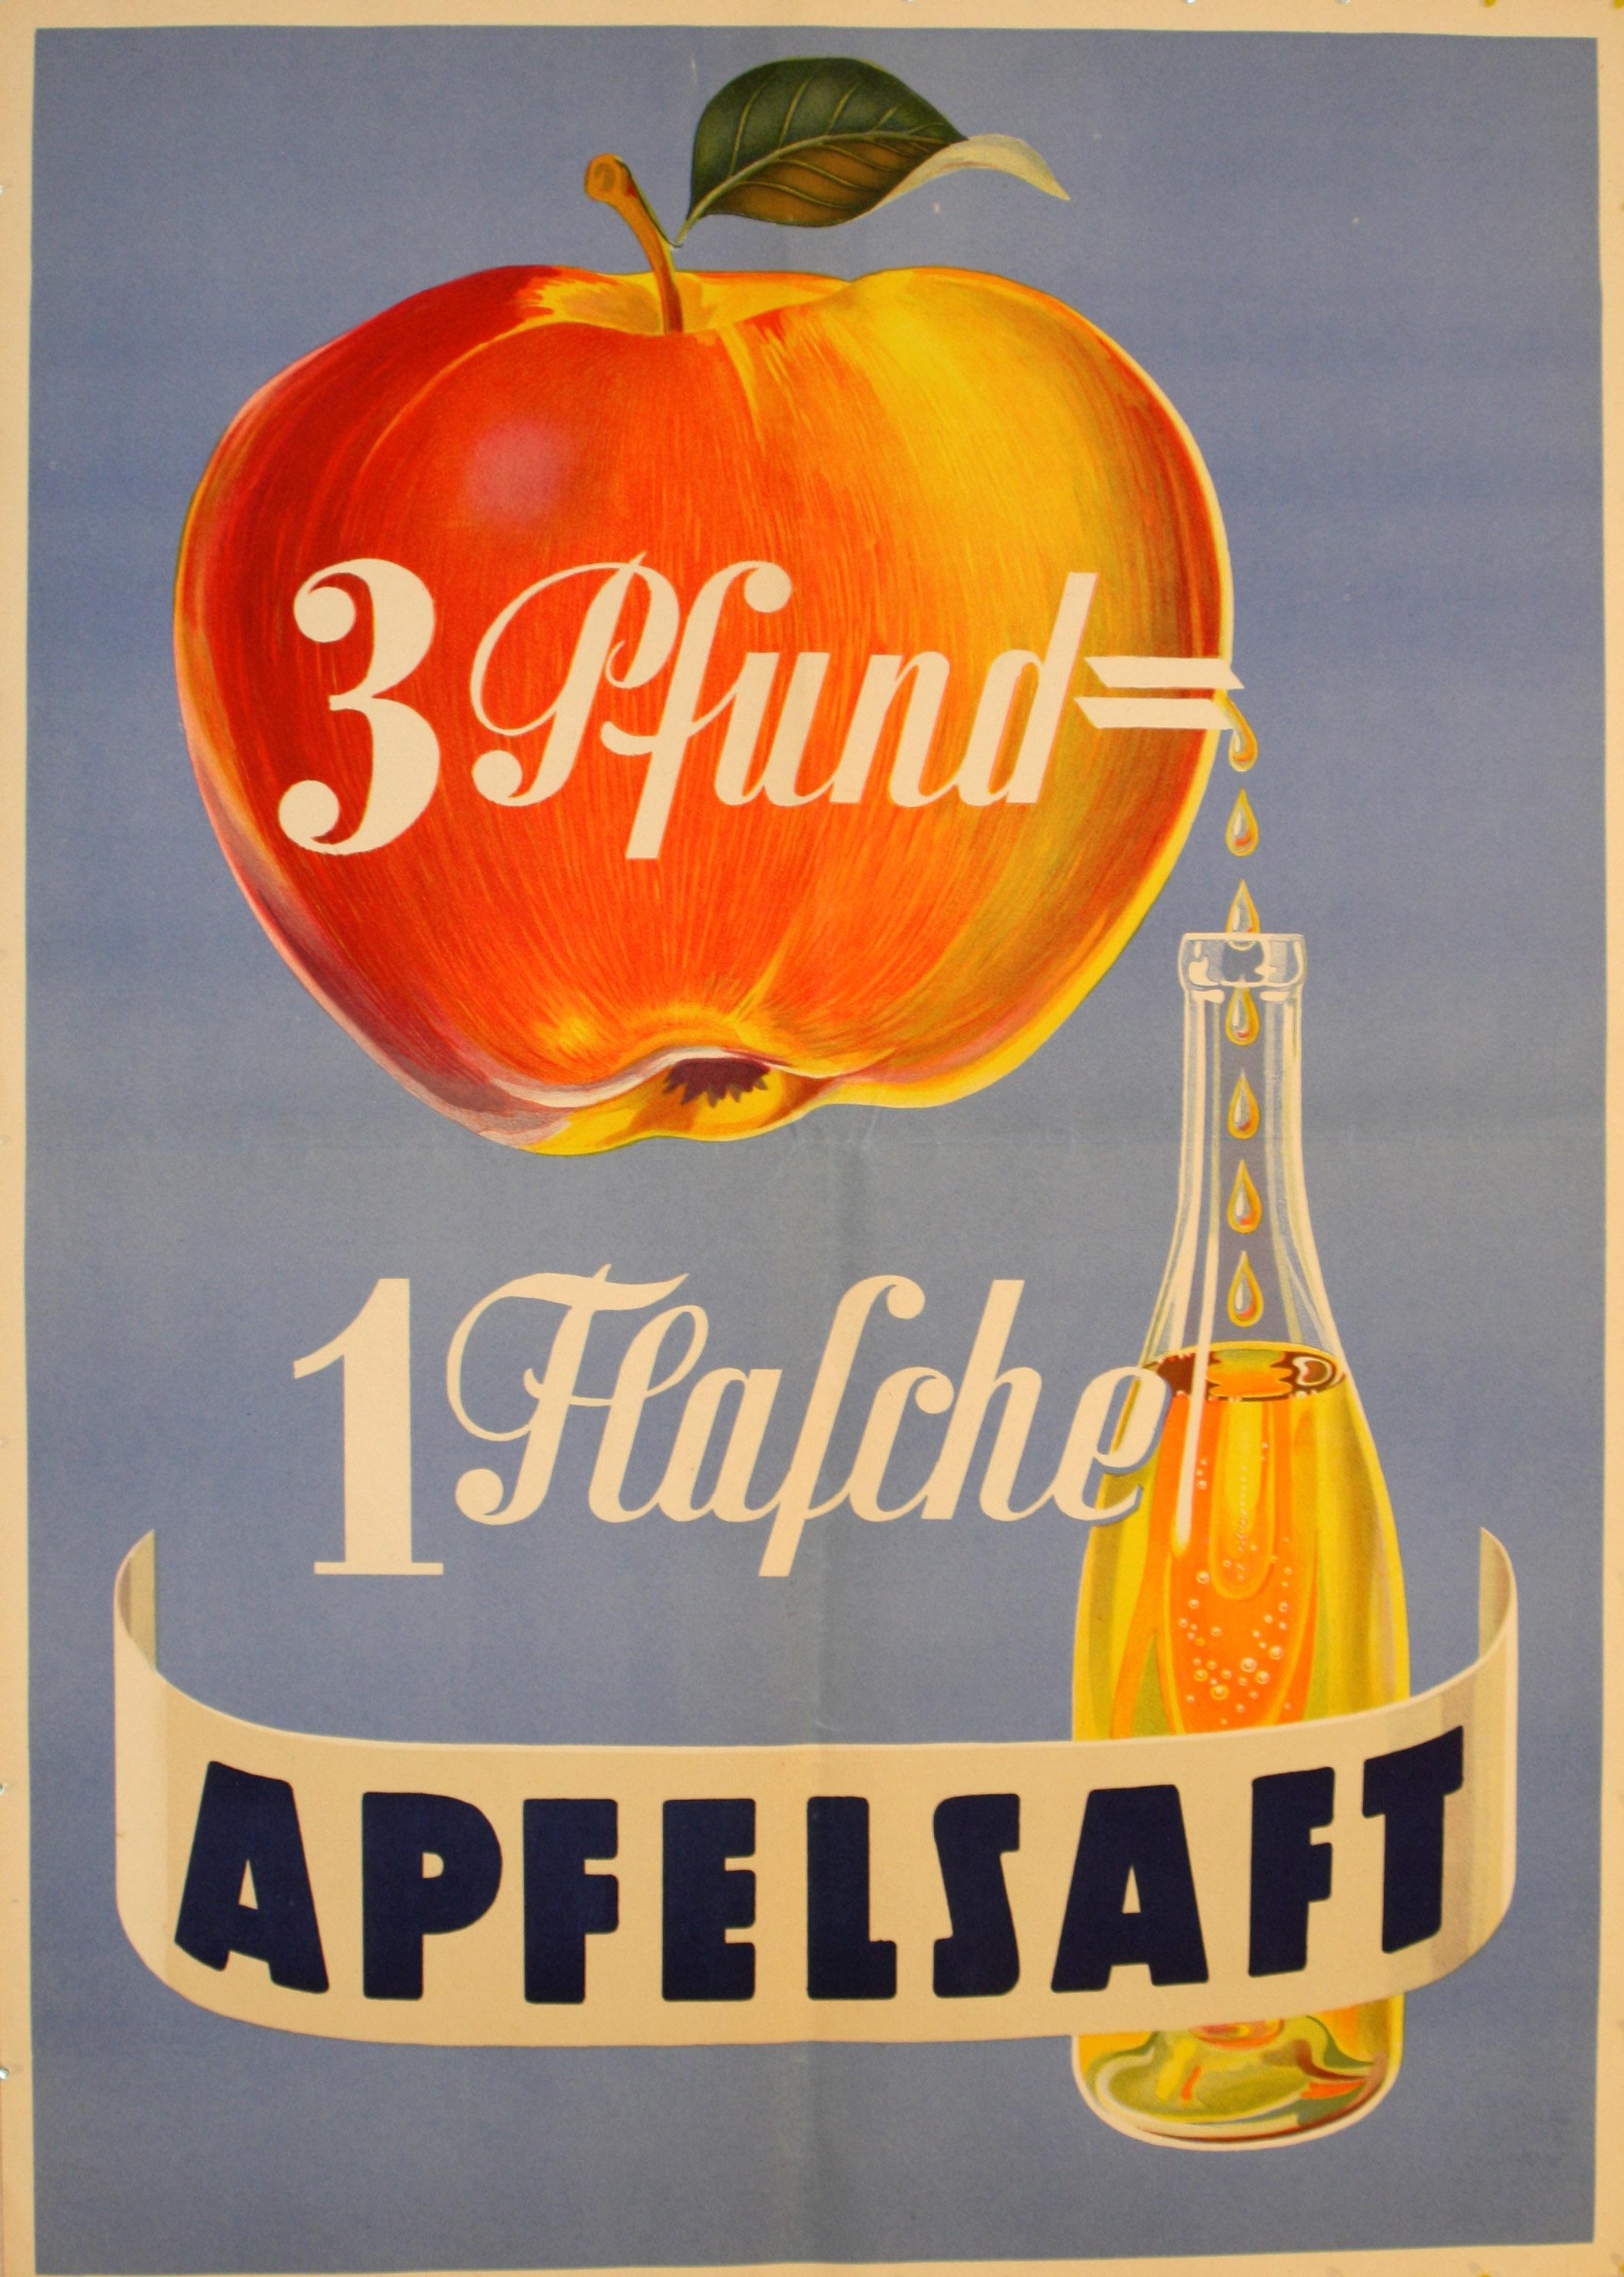 Lot 1300 - Advertising Posters Apple Juice